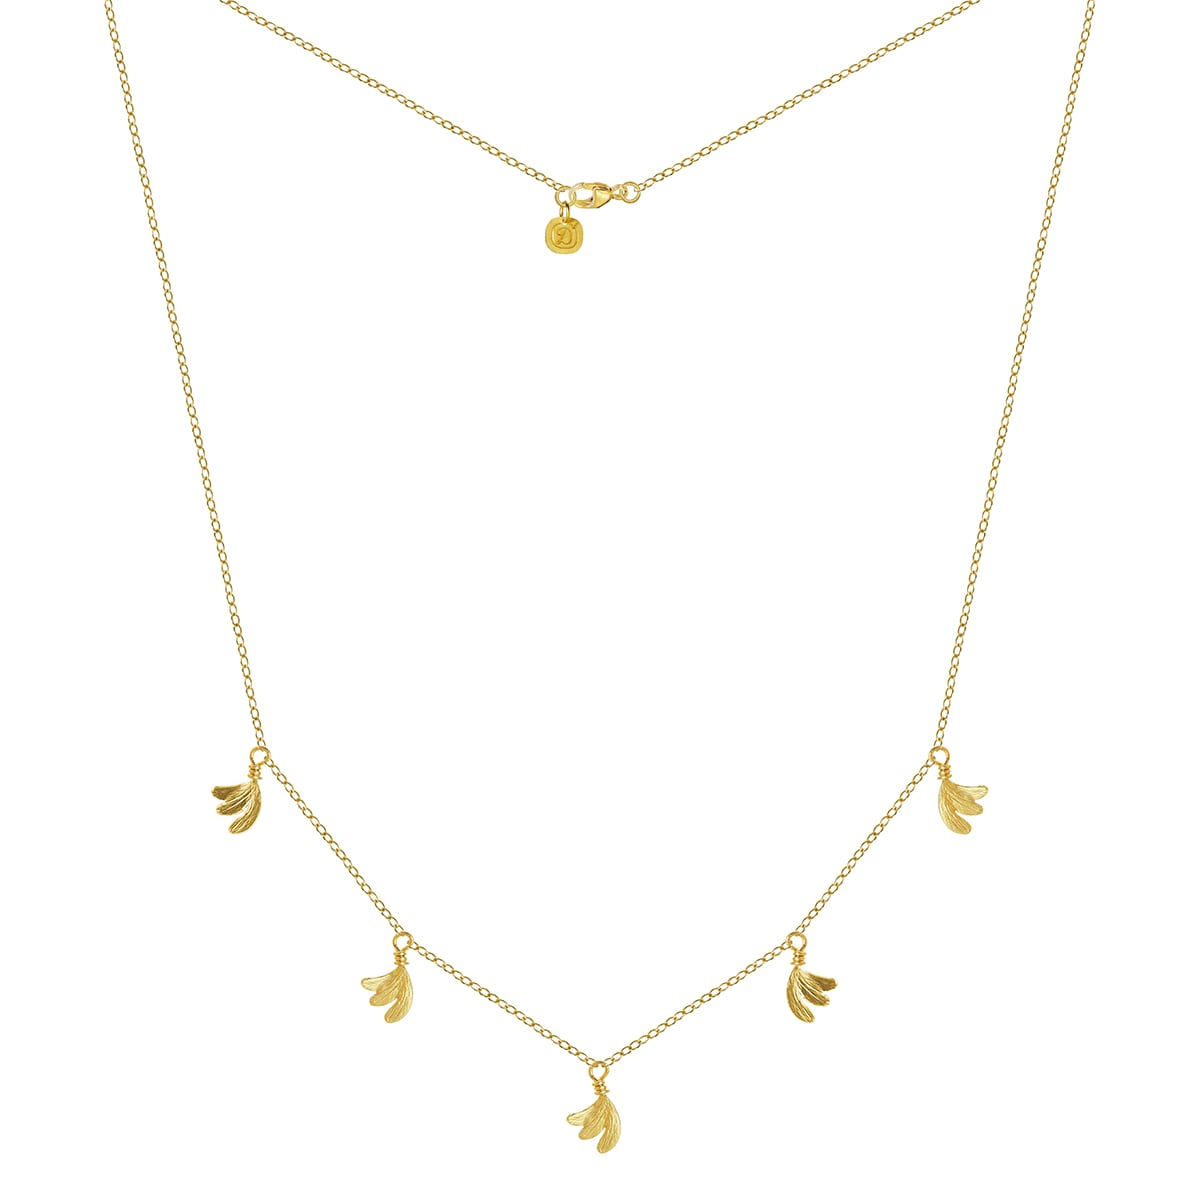 Dulong, Fine Jewelry_Aura_Guldhasband_AUR5-A1010_hos_Jarl_Sandin